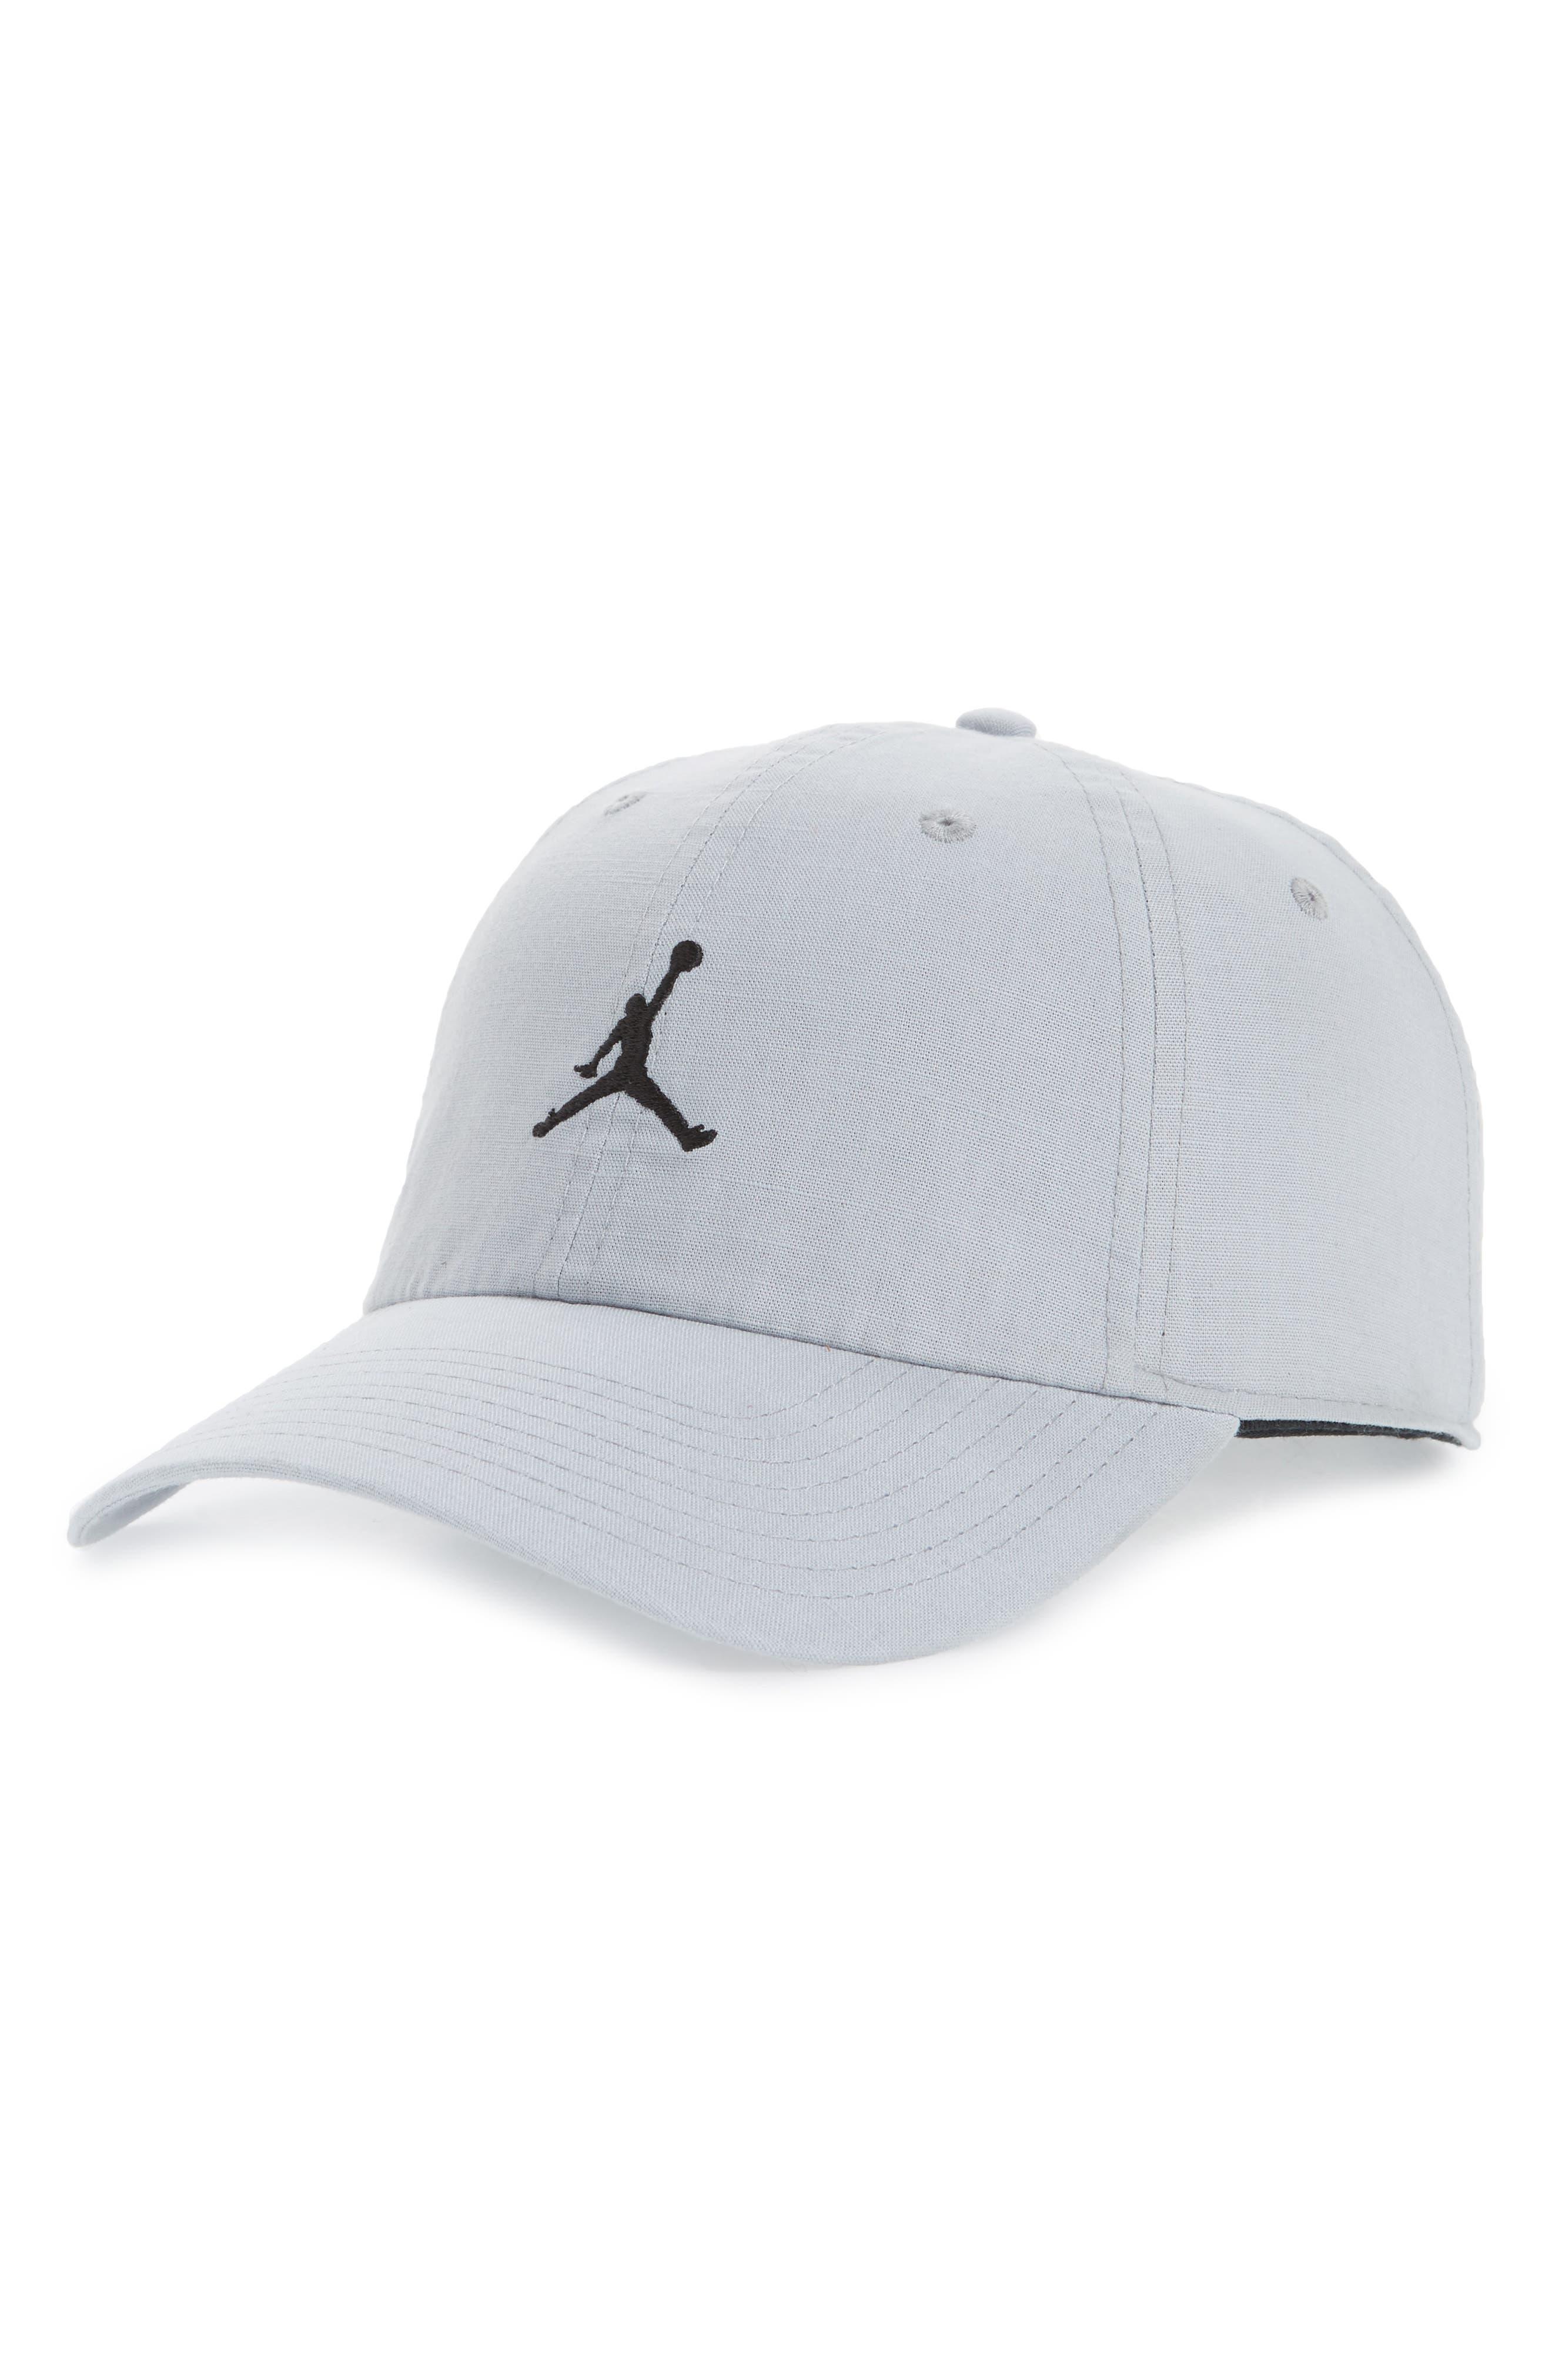 Jordan H86 Jumpman Washed Baseball Cap,                             Main thumbnail 1, color,                             012